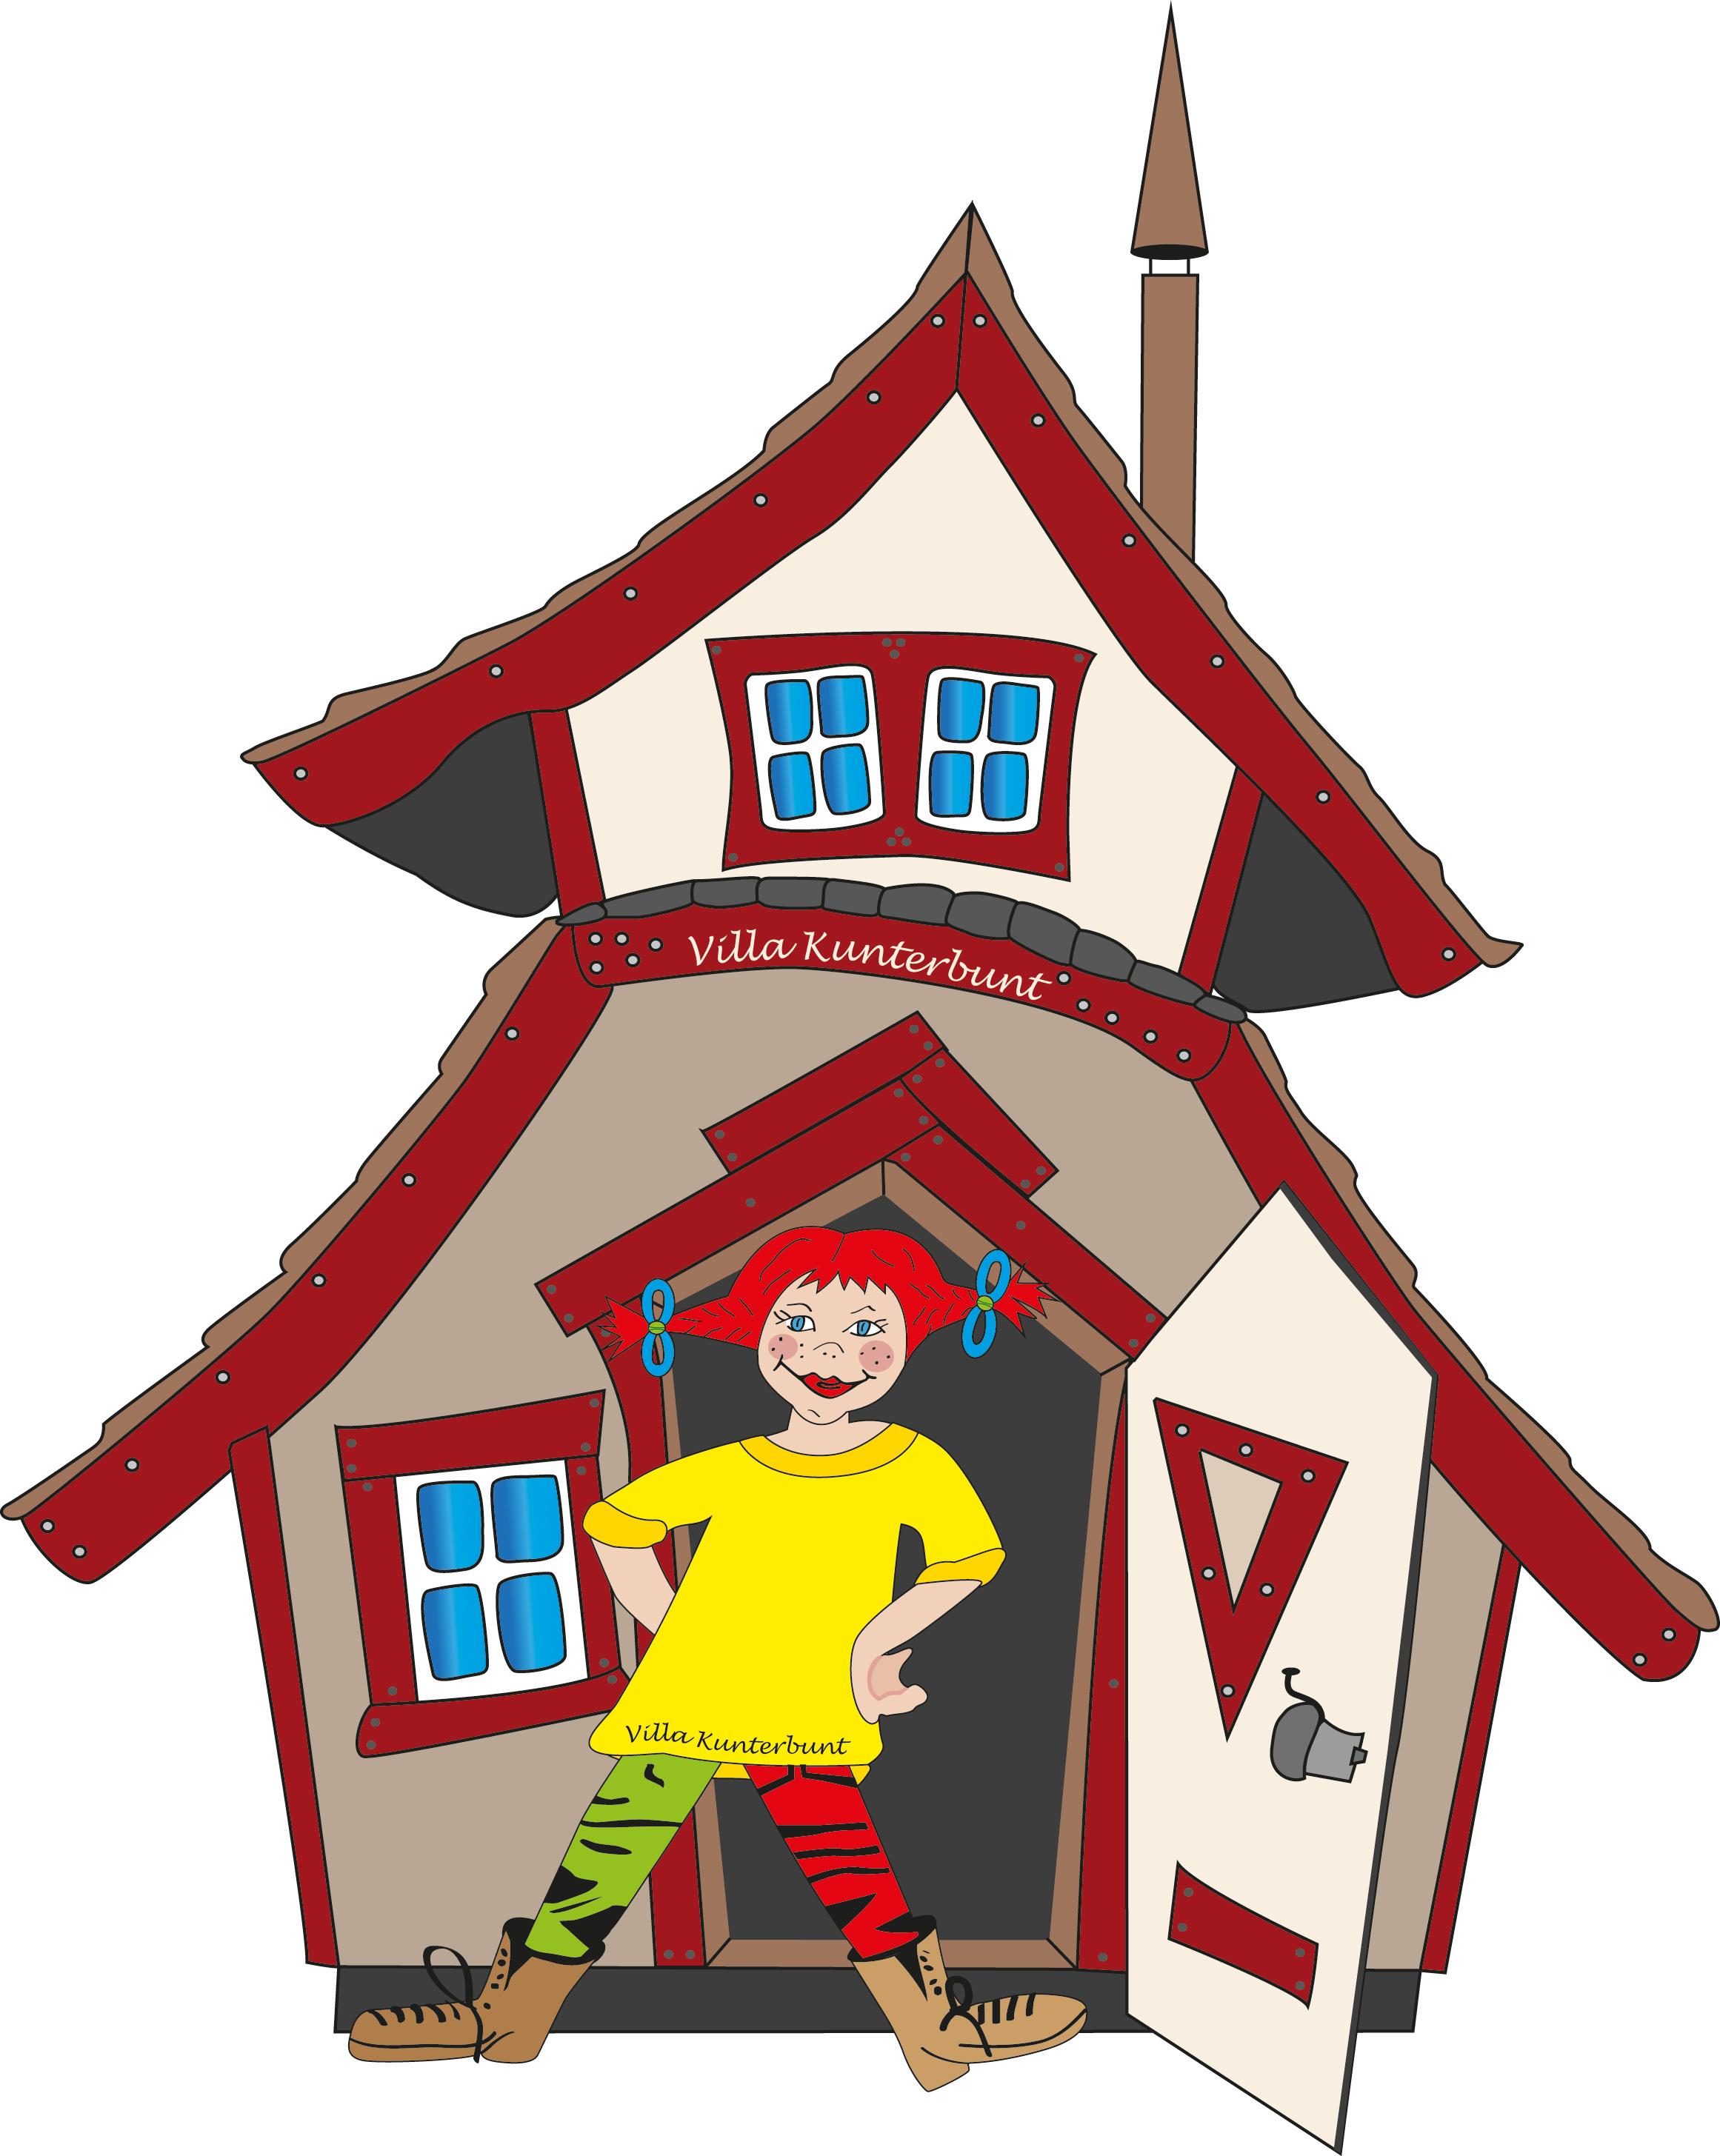 Kindertageseinrichtung Villa Kunterbunt e.V.